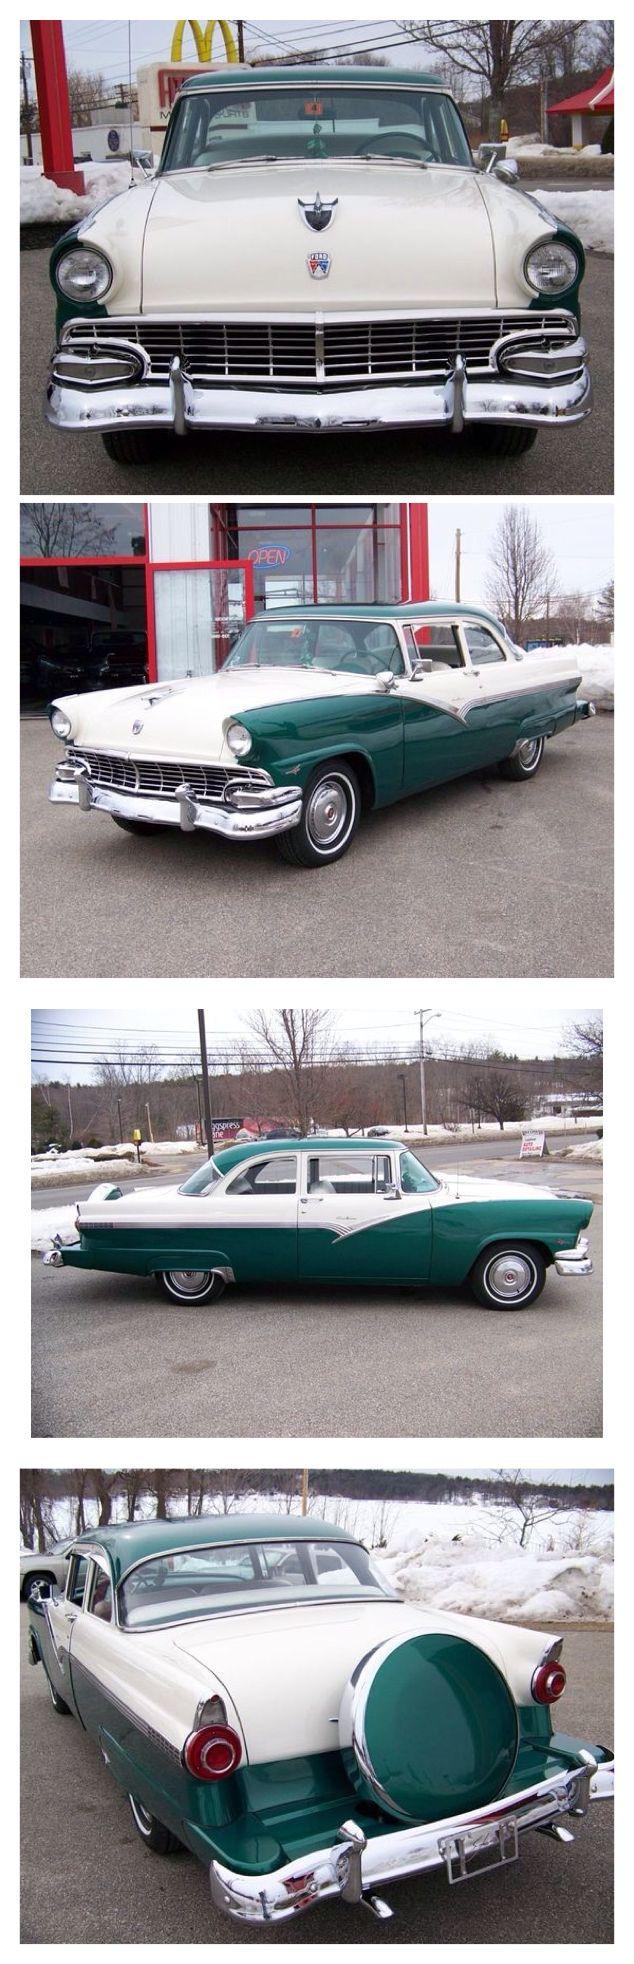 1956 ford customline wagon old car hunt - 1956 Ford Fairlane